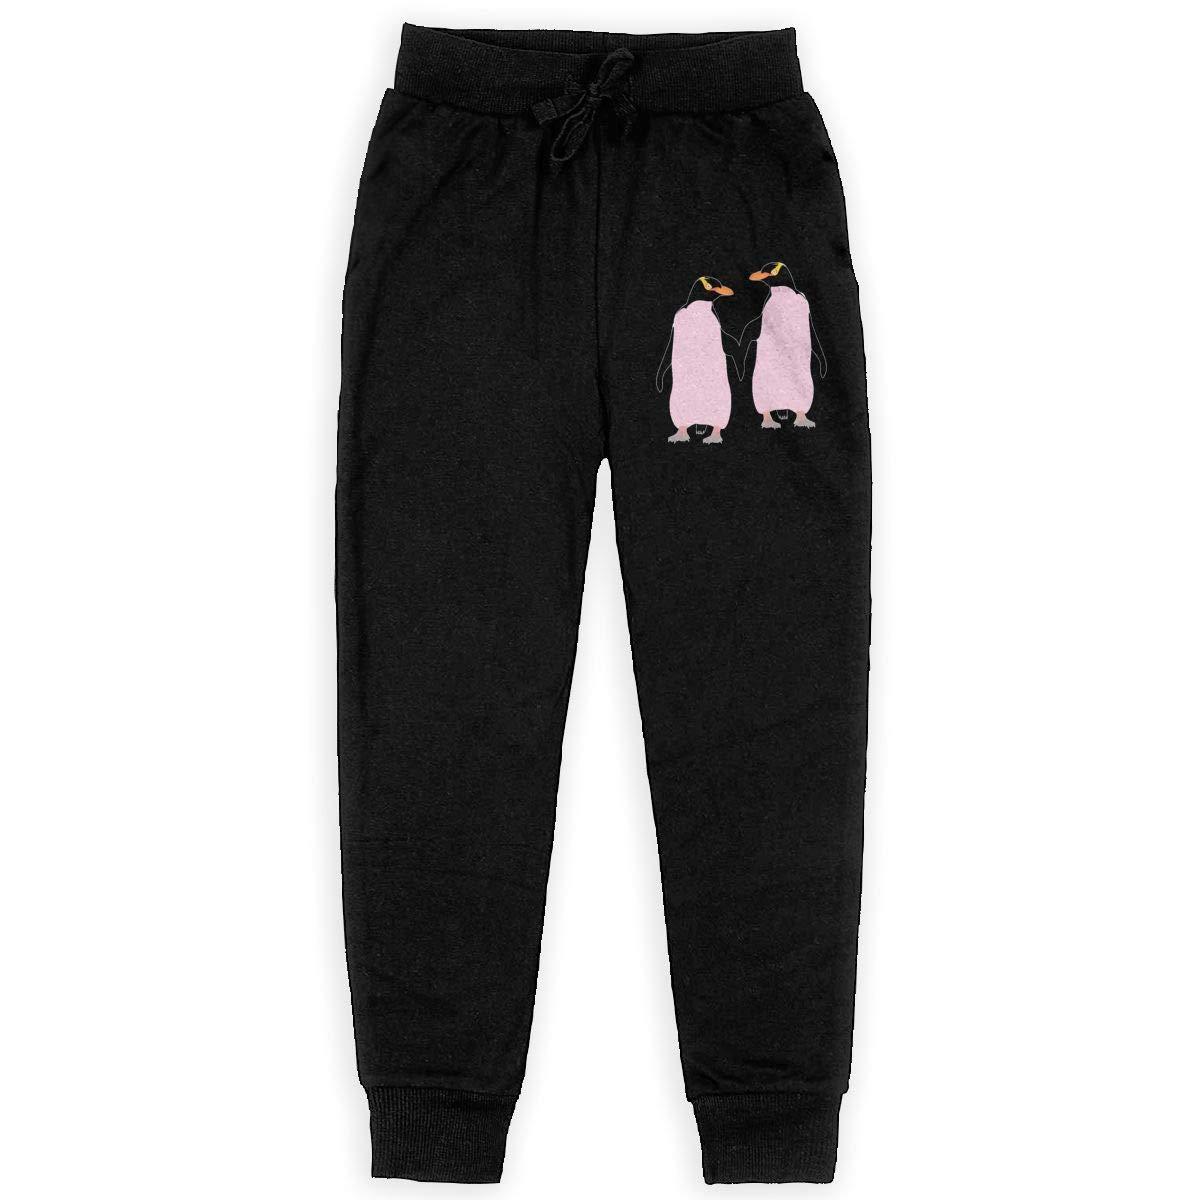 Kim Mittelstaedt Lesbian Penguin Boys Big Active Basic Casual Pants Sweatpants for Boys Black